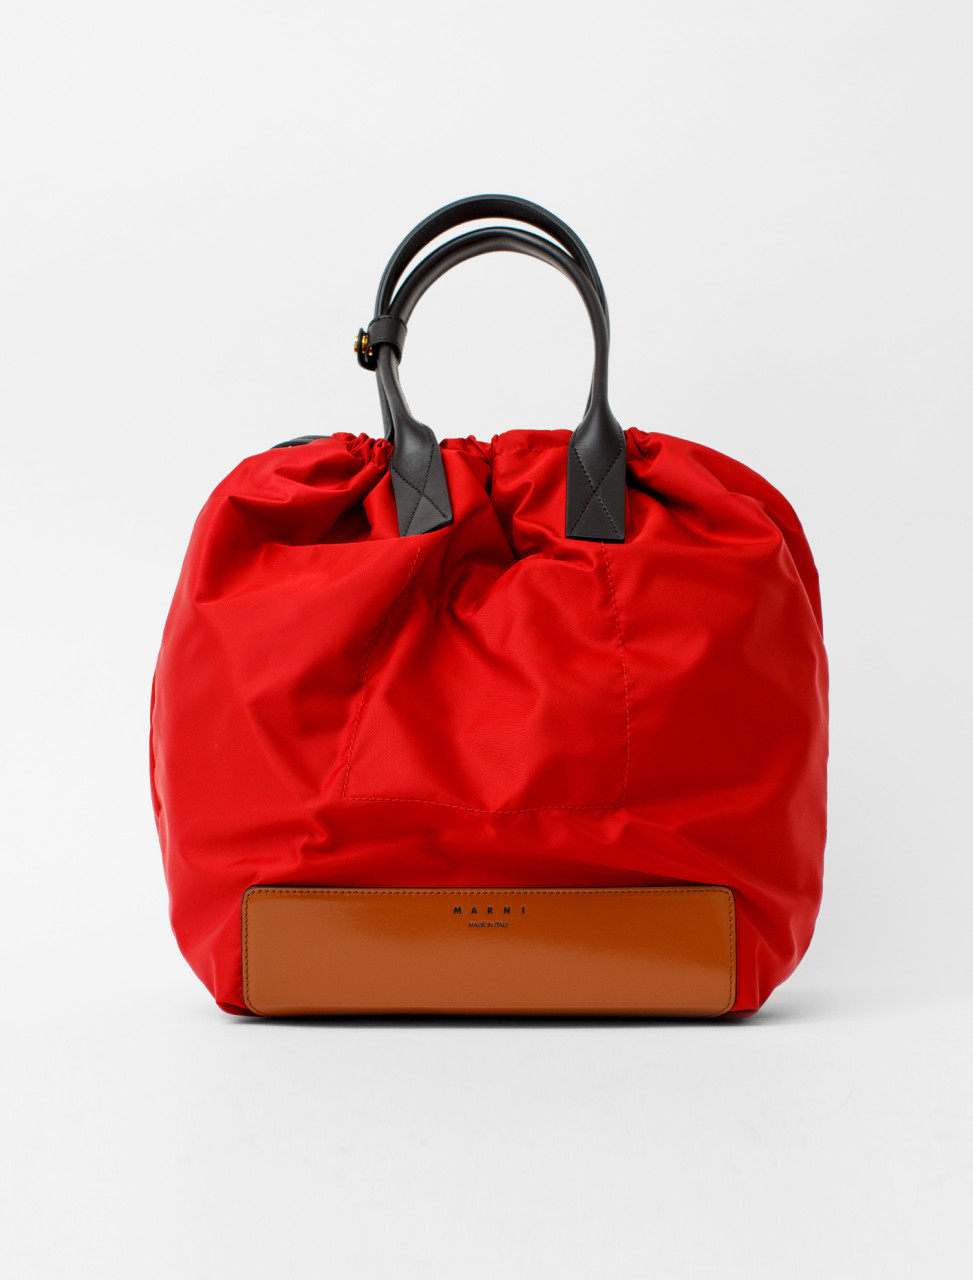 Marni Pedestal Shopping Bag